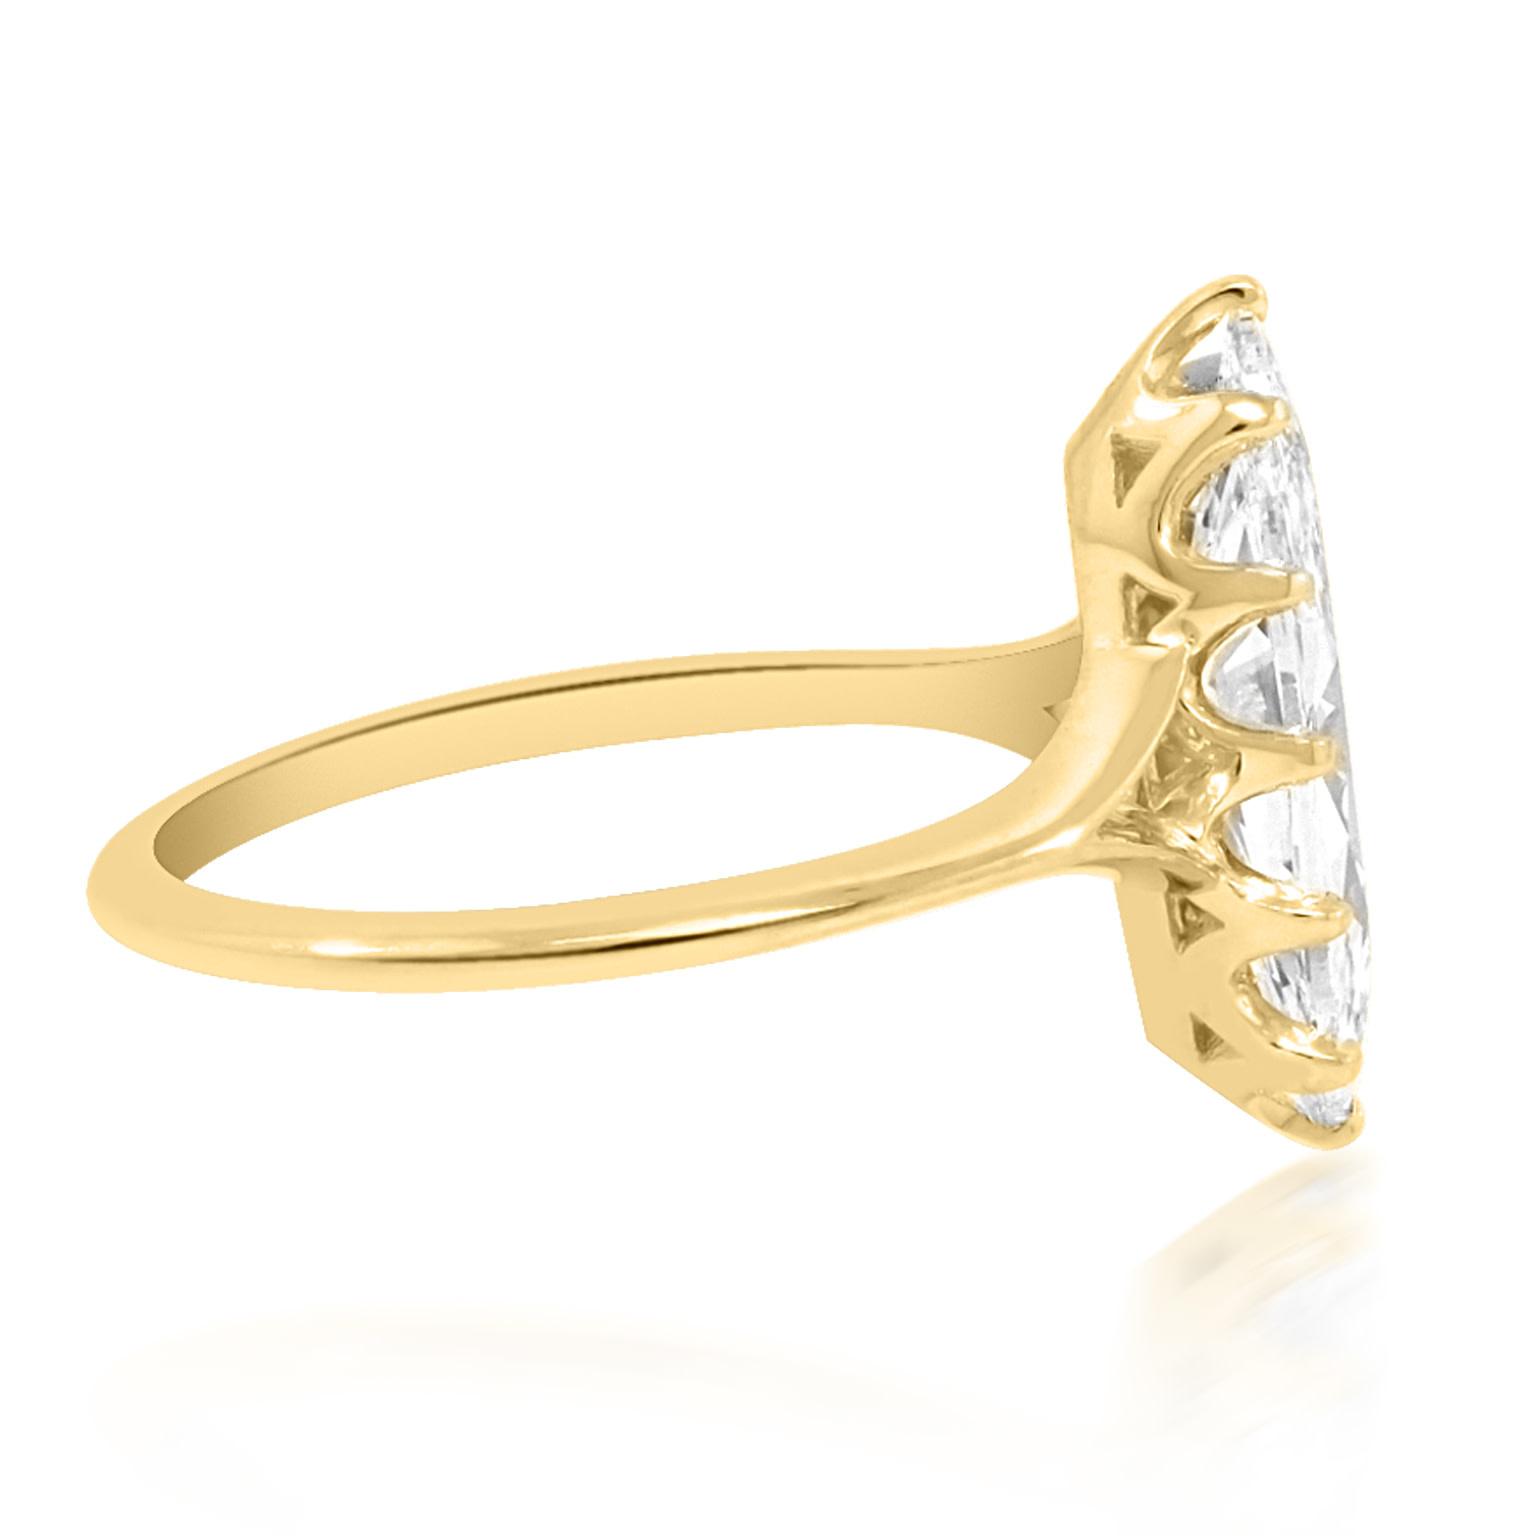 Trabert Goldsmiths 1.62ct DVS2 Marquise Diamond Orion Ring